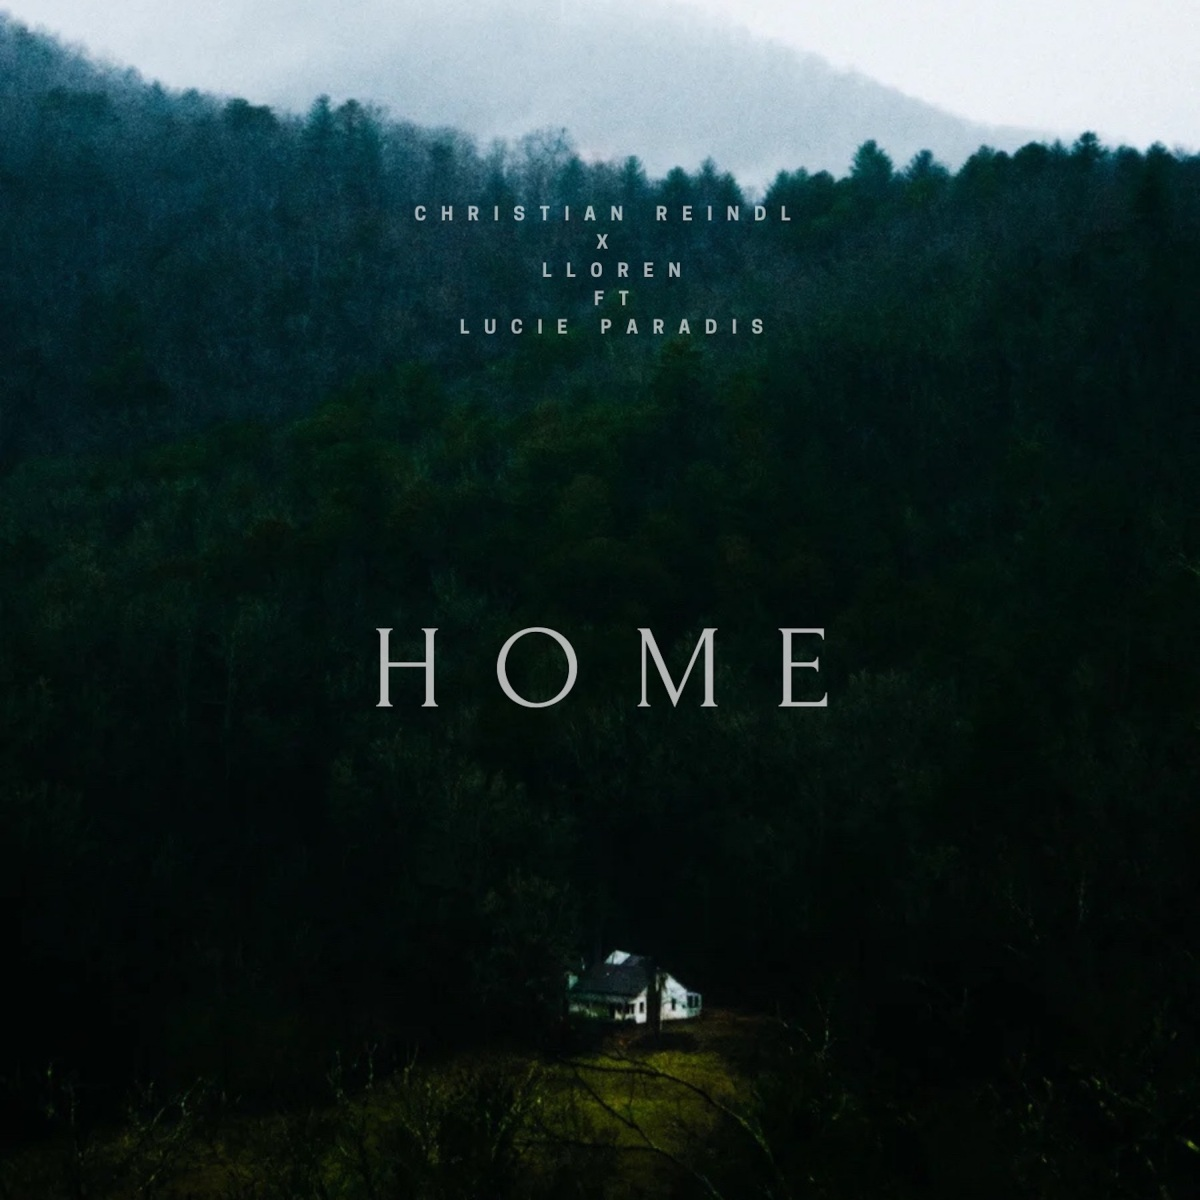 Christian Reindl x Lloren feat. Lucie Paradis –Home